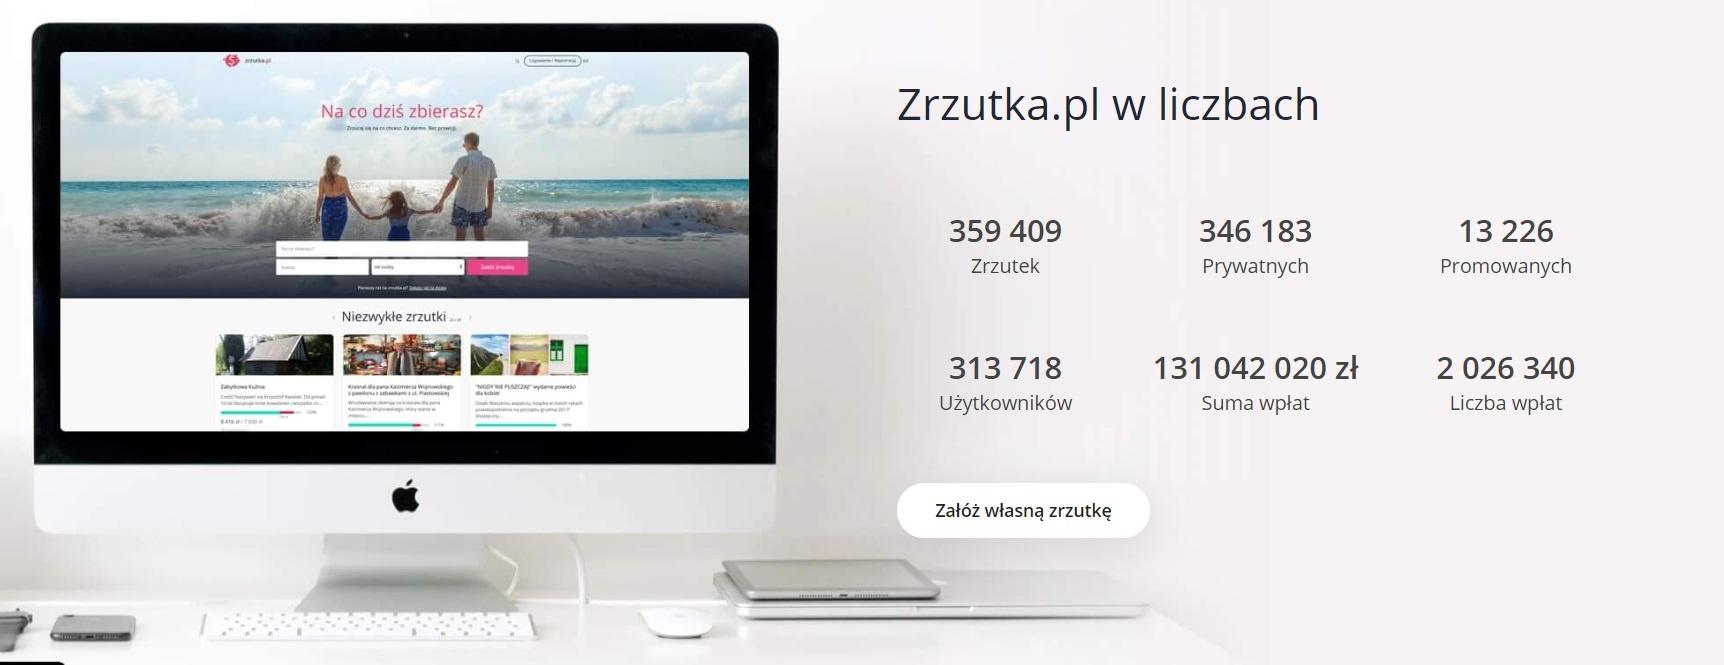 Zrzutka_100M